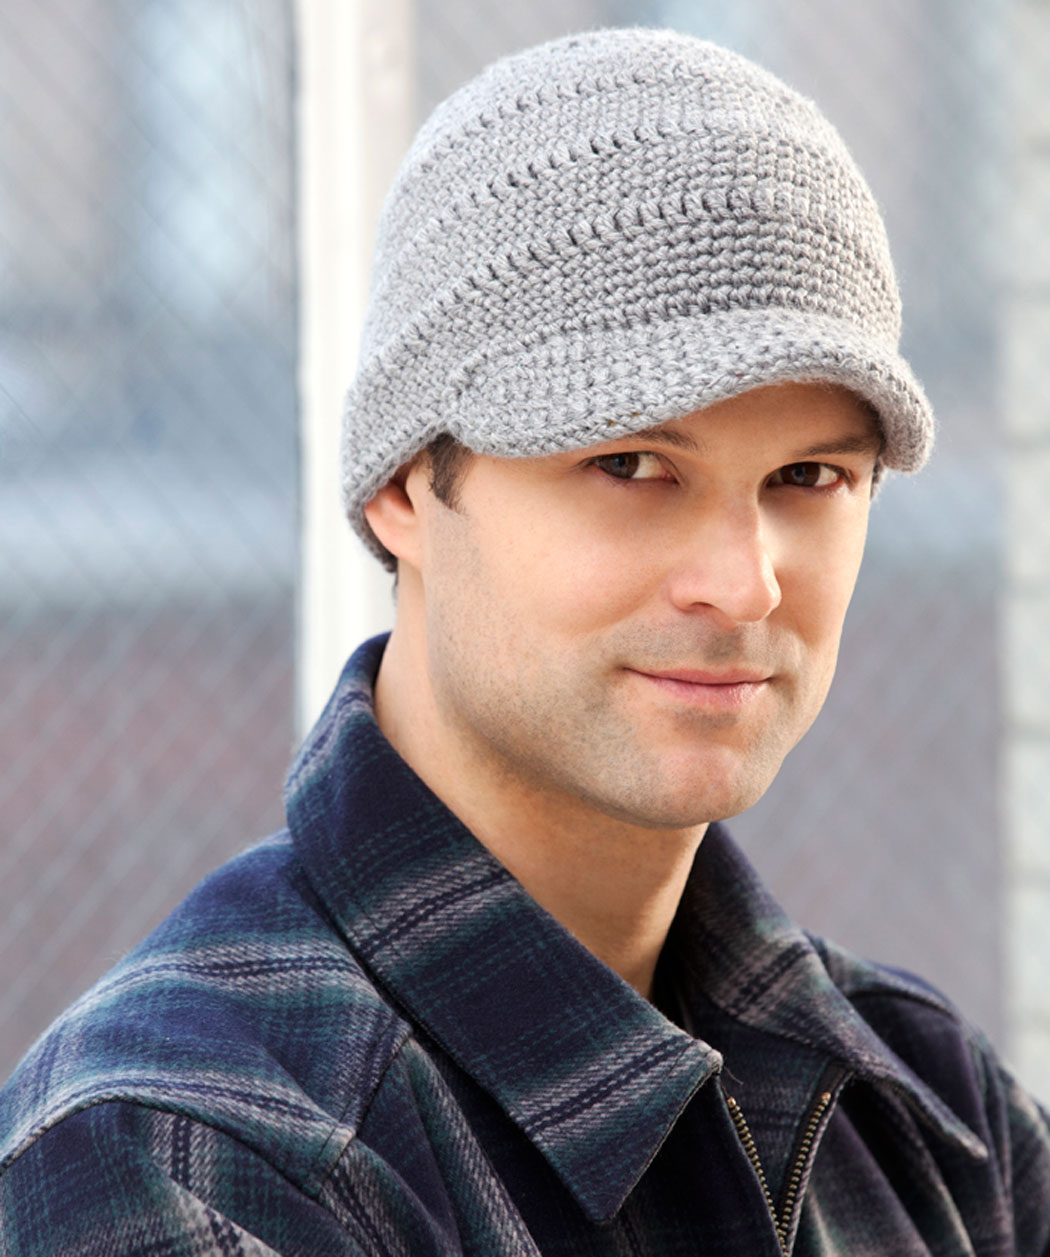 Streetwise Brim Hat Knitting Pattern For Men